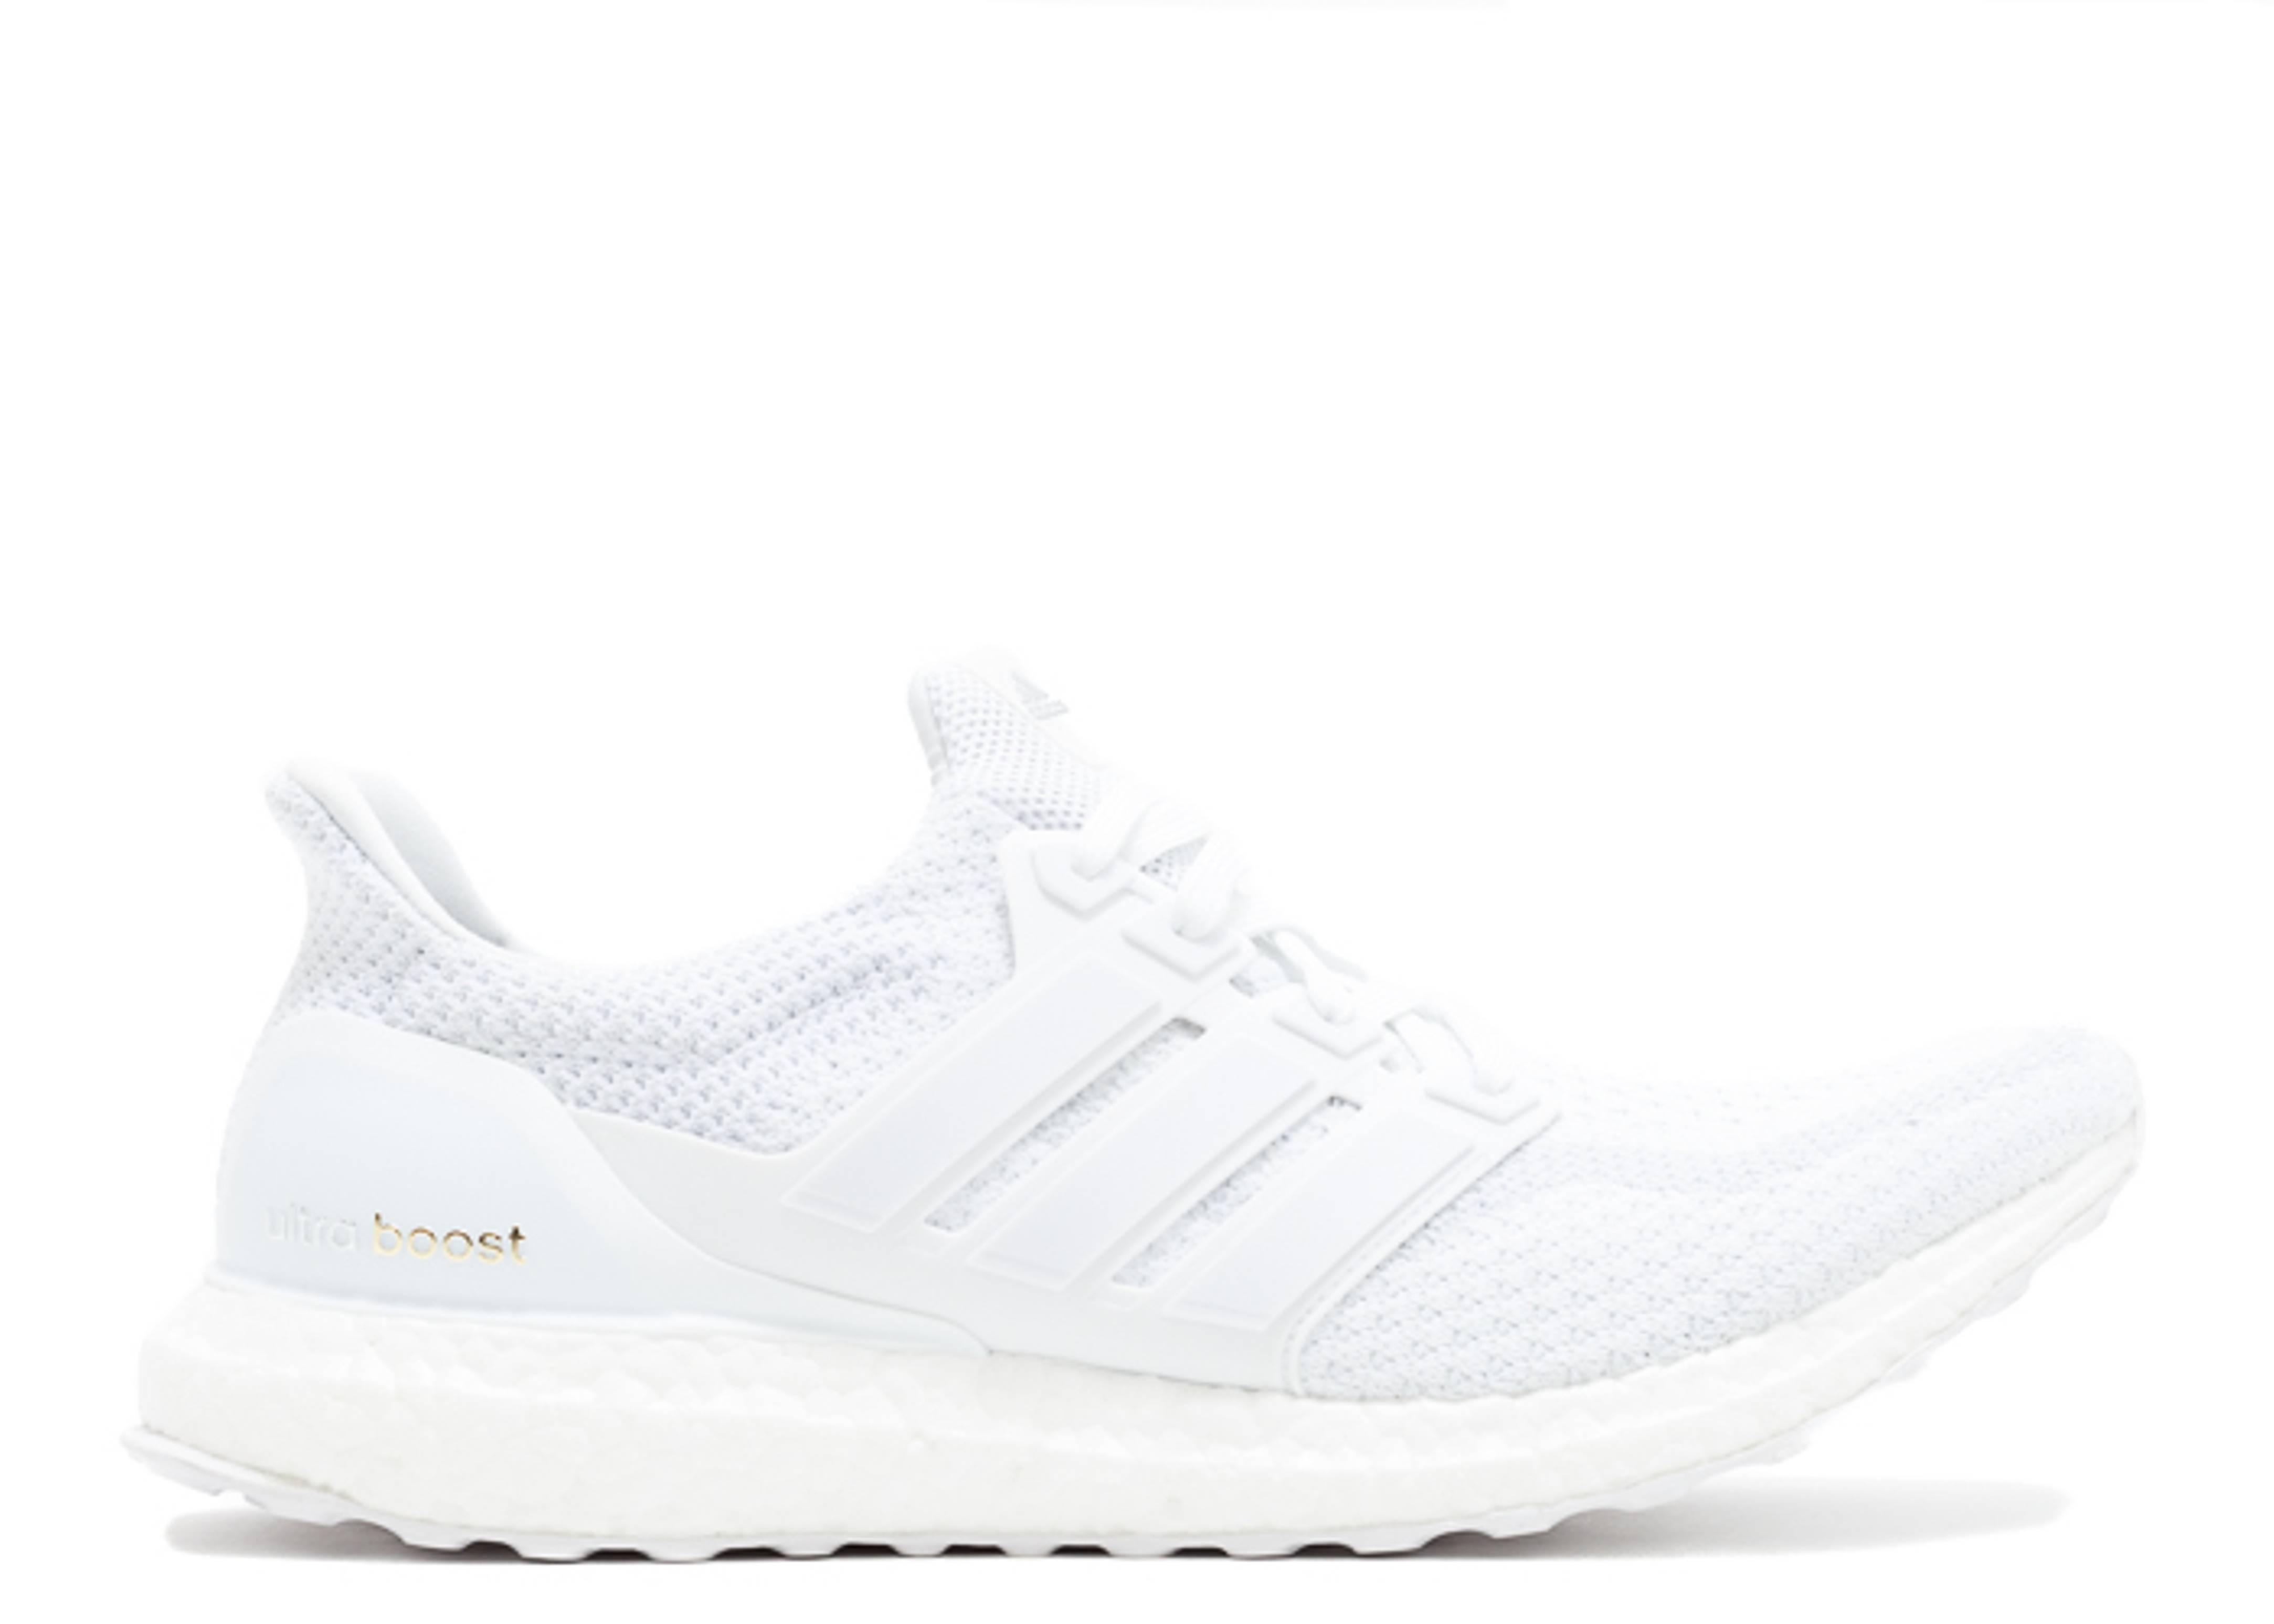 release date beauty performance sportswear Ultra Boost M - Adidas - aq5929 - white/white | Flight Club